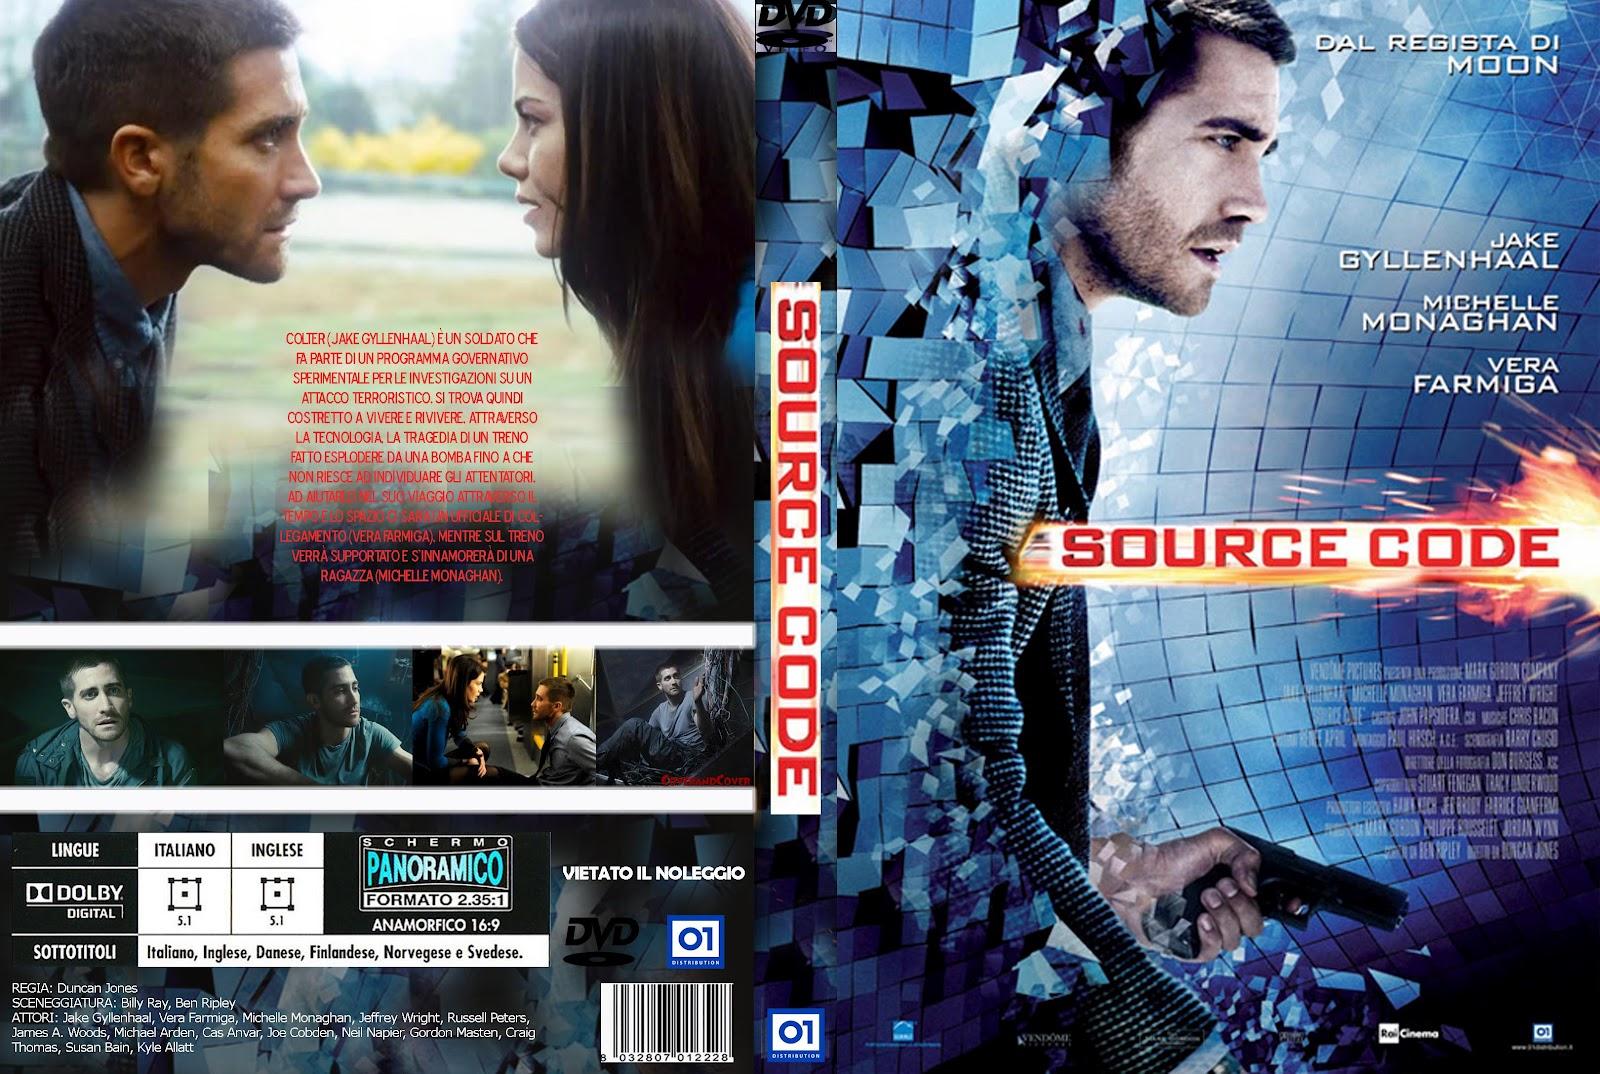 Source Code Imdb